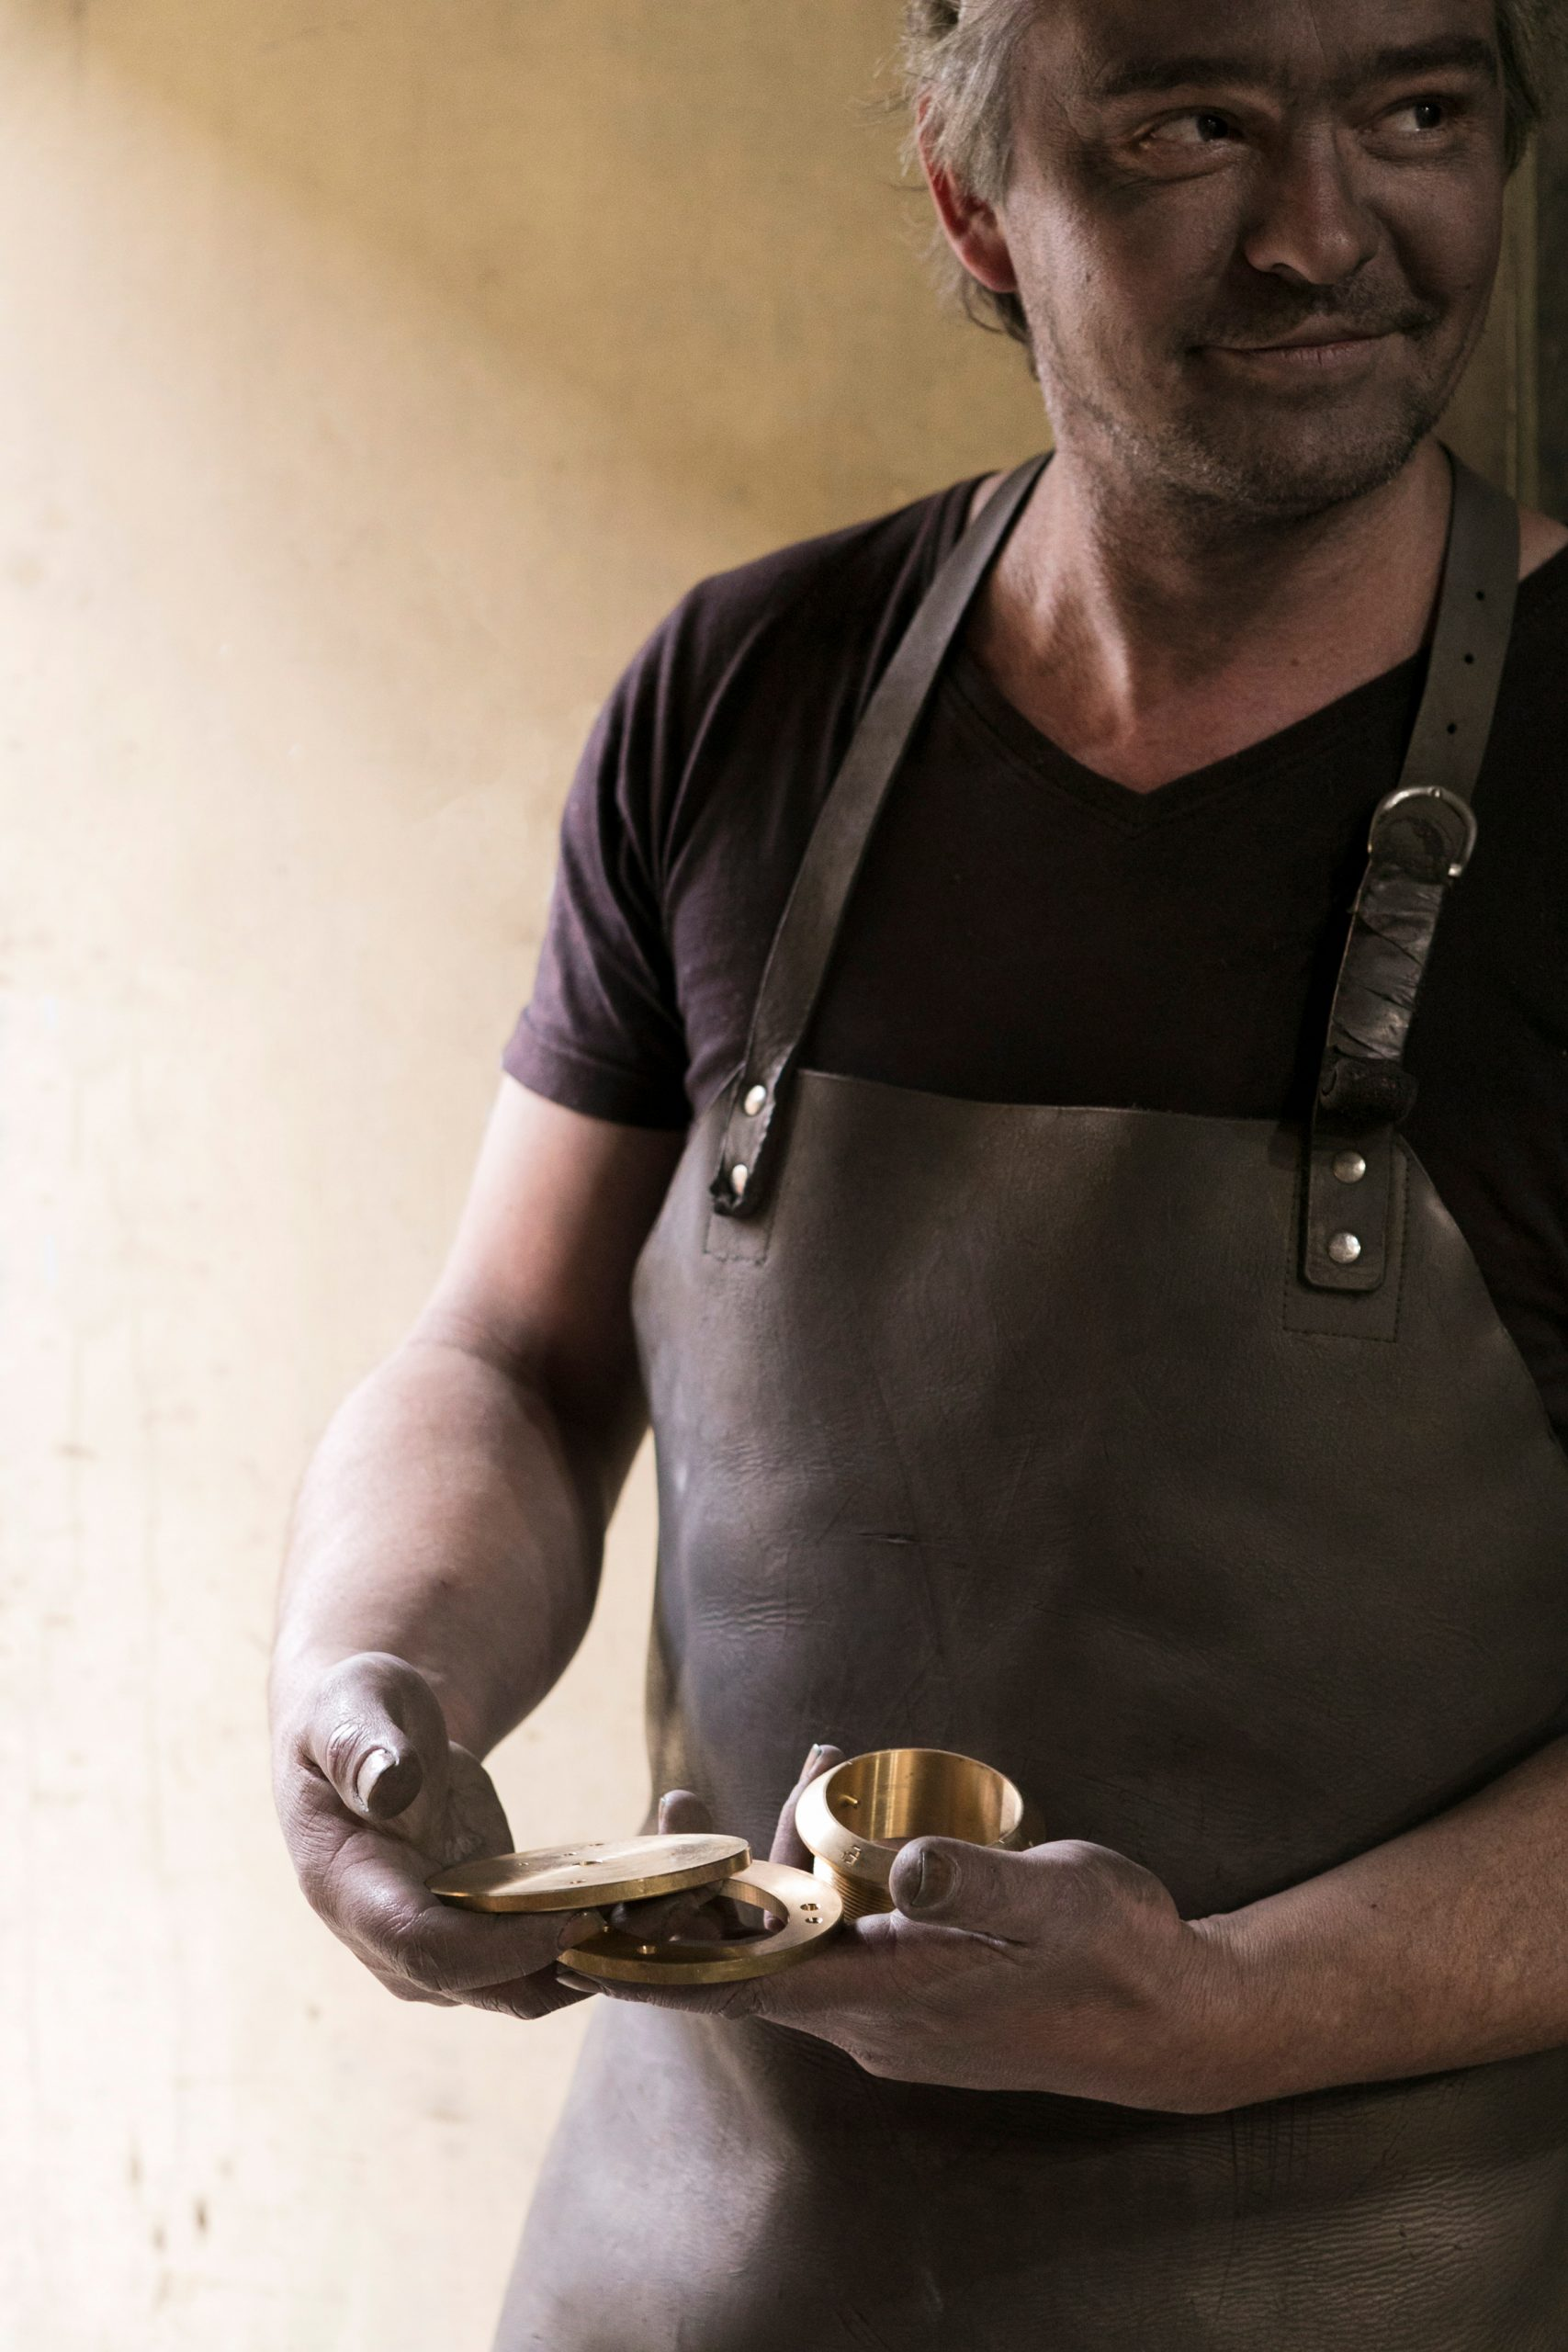 Short film by Articolo celebrates the art of handmade craftsmanship